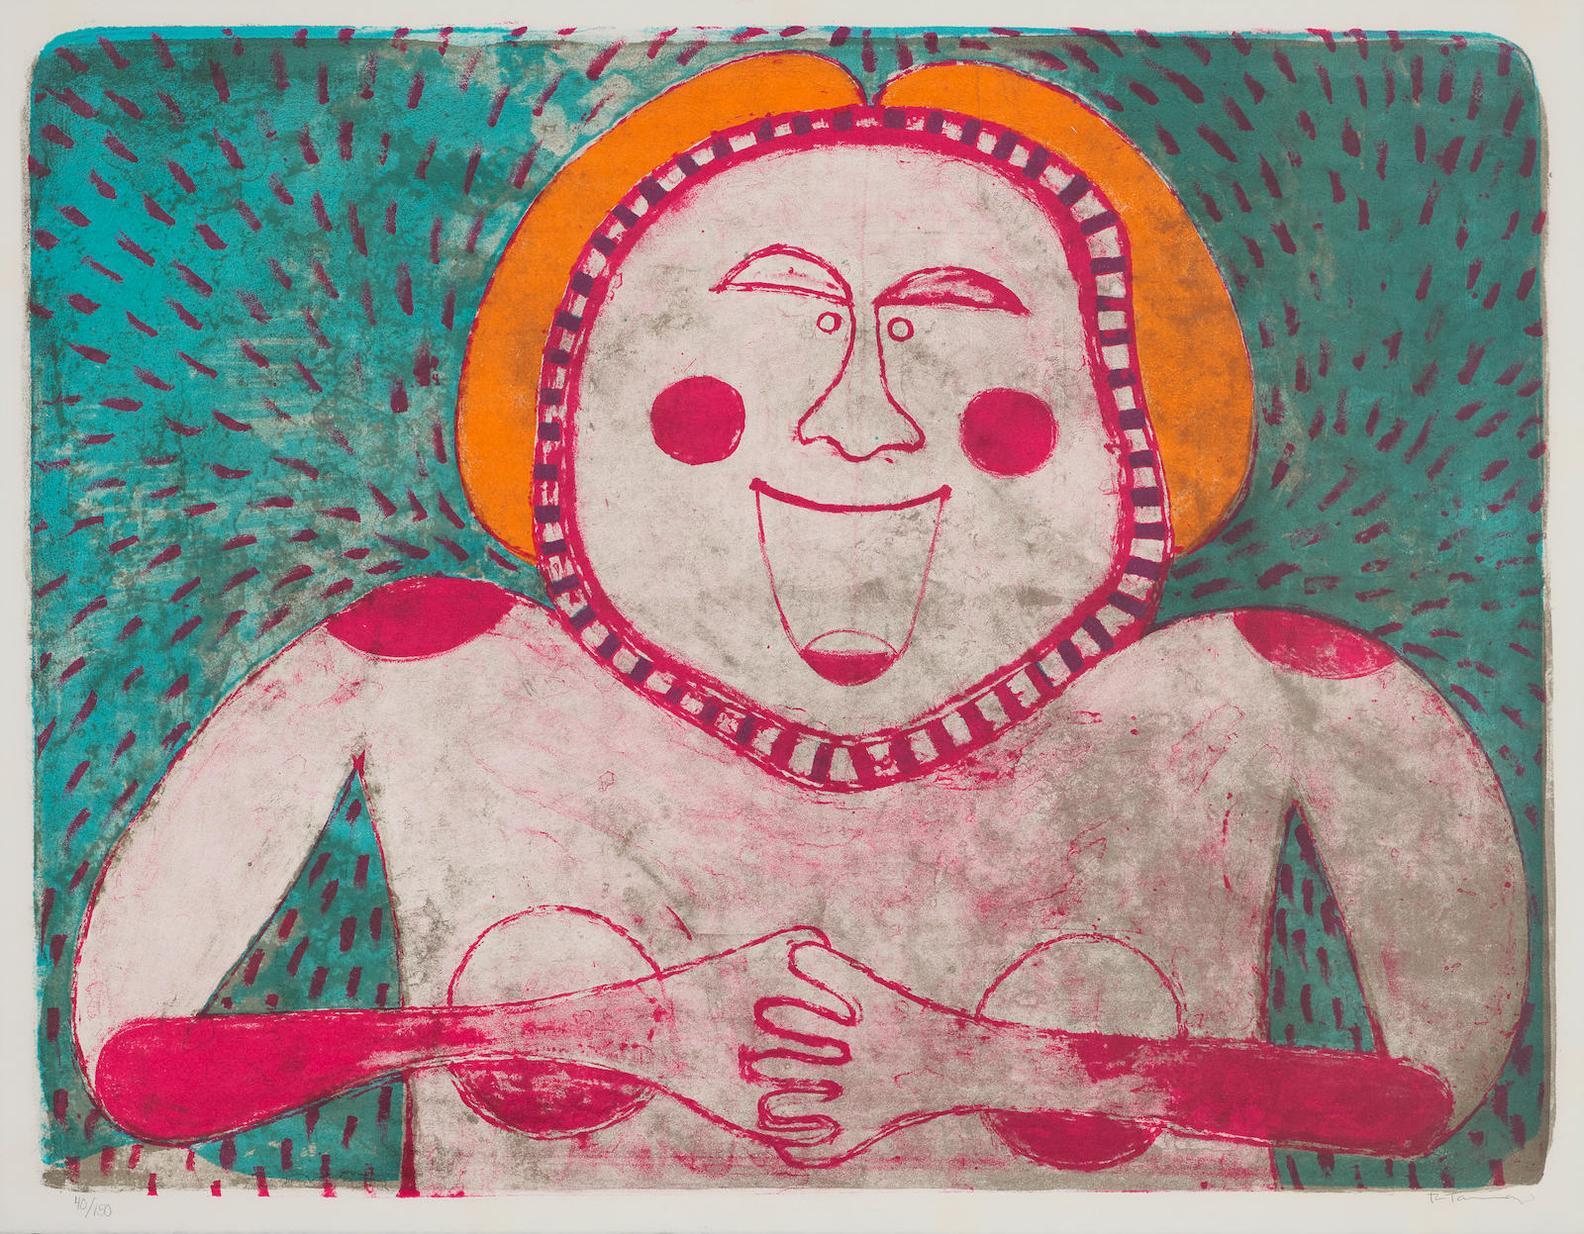 Rufino Tamayo-Mujer Sonriente, From Mujeres-1969